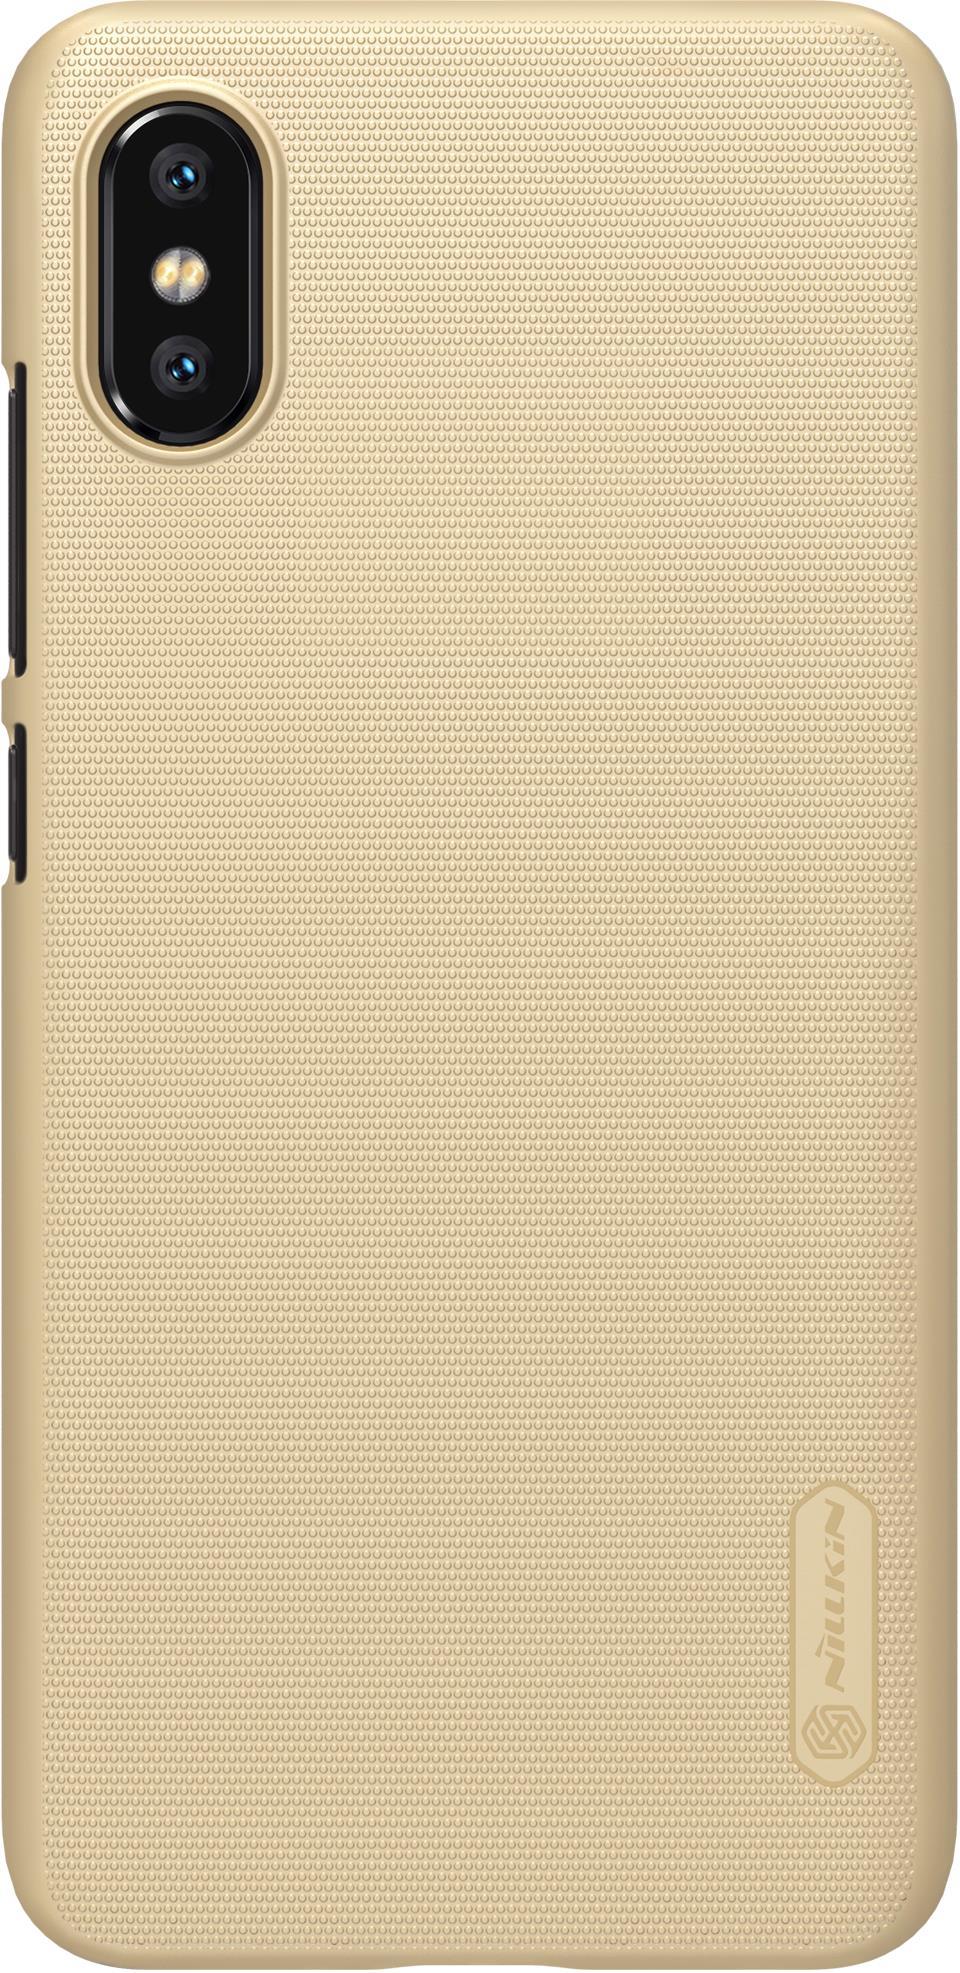 Чехол для сотового телефона Nillkin T-N-XM8E-002, черный защитный чехол nillkin super frosted shield для xiaomi mi 9 gold